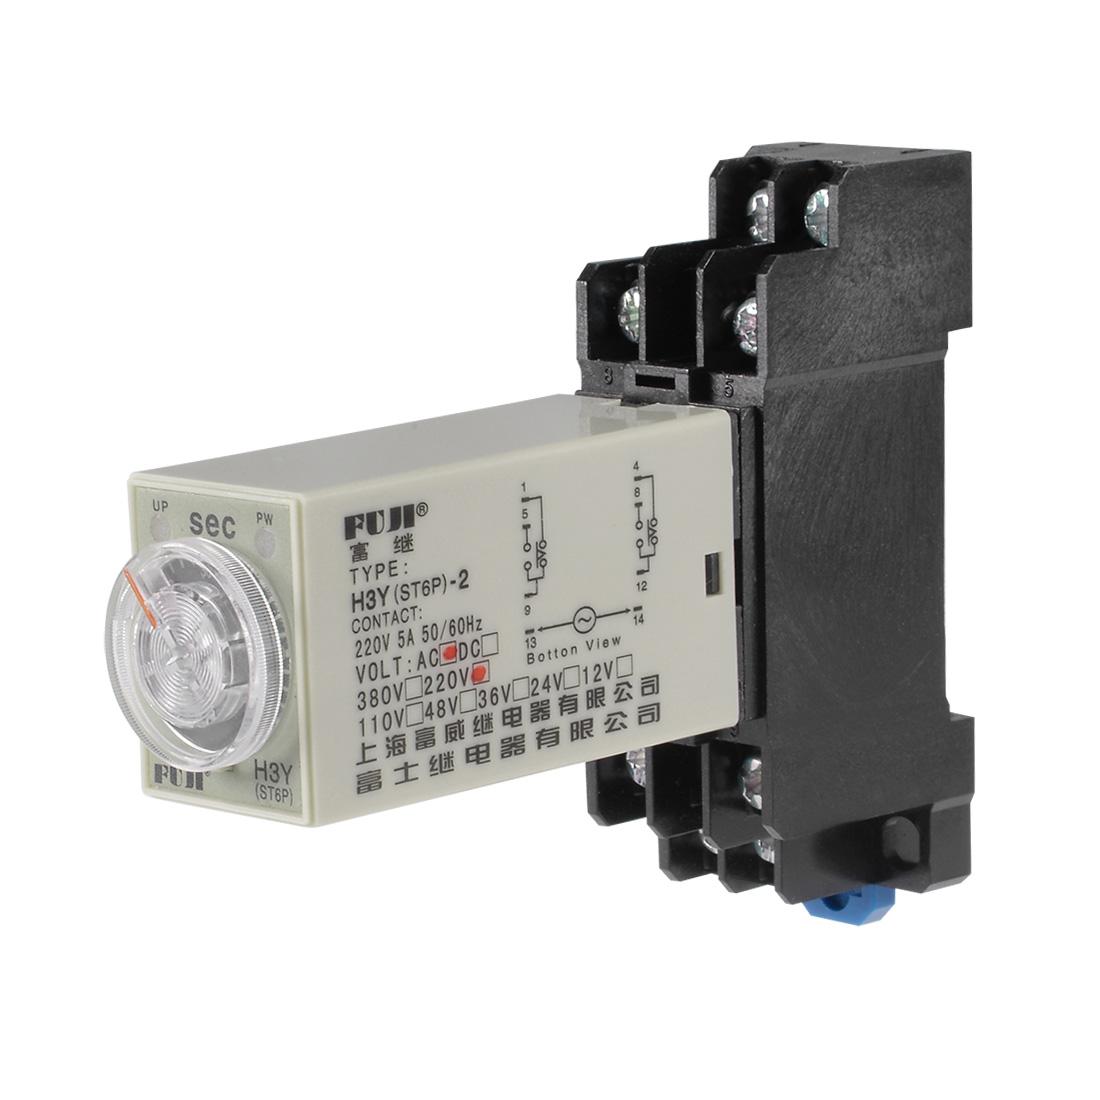 220VAC 60S 8 Terminals Range Adjustable Delay Timer Time Relay H3Y-2 w base - image 6 of 6